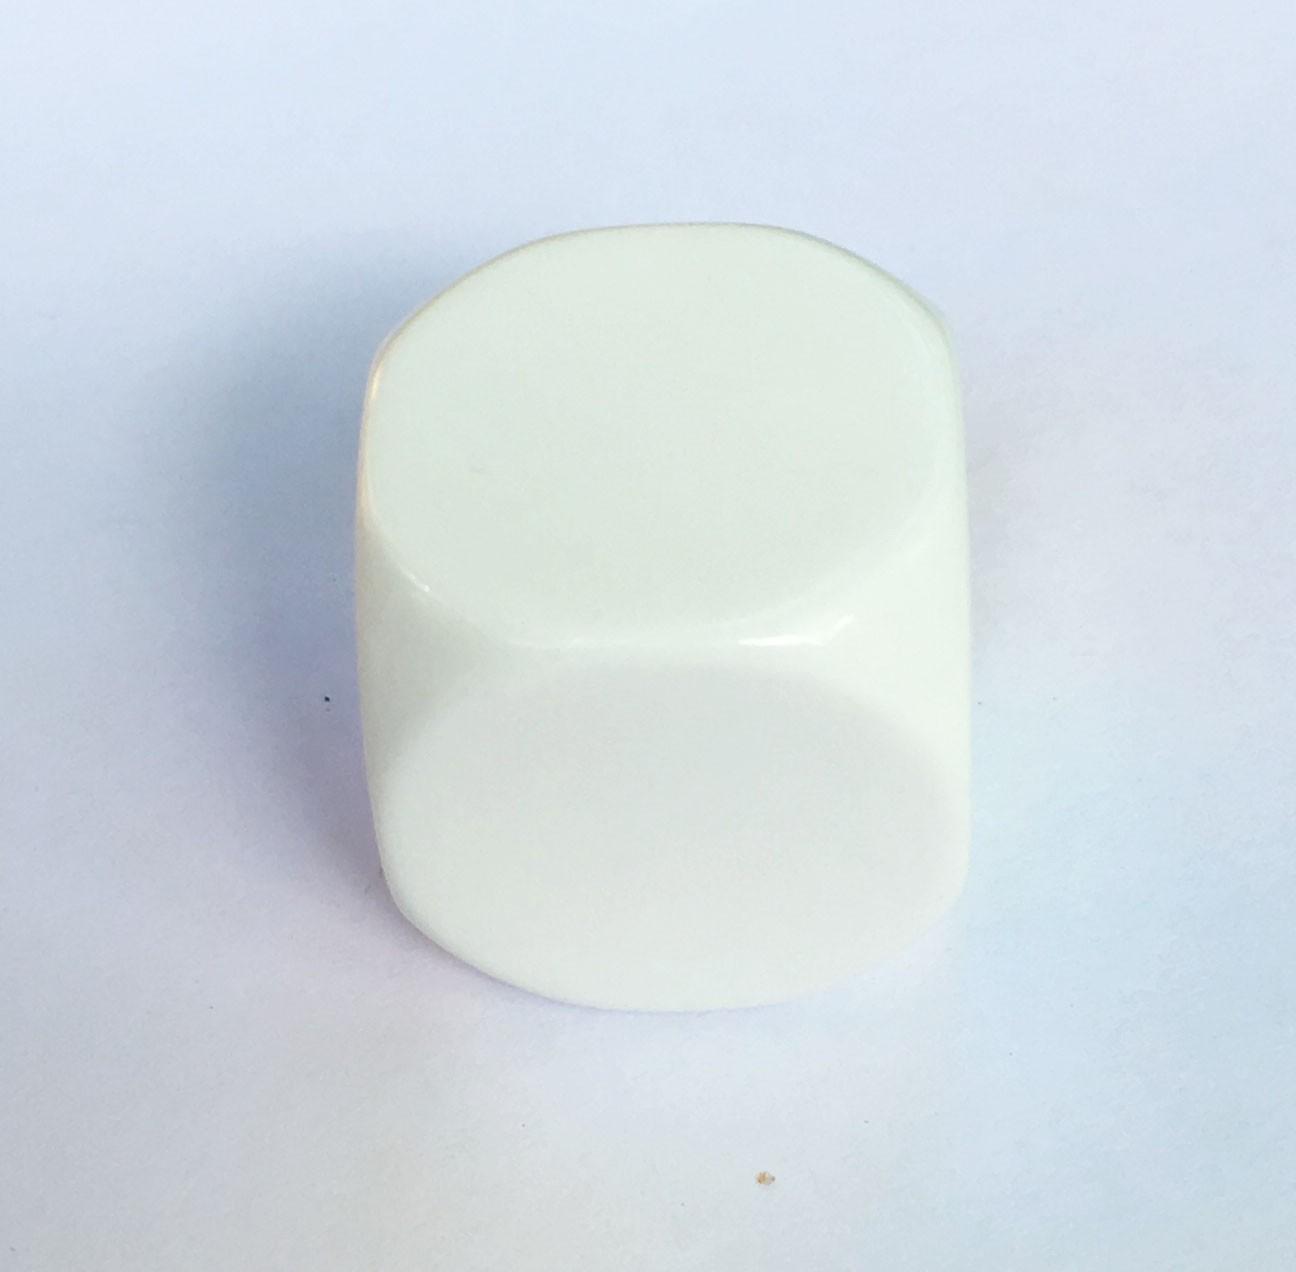 22mm Blank White Single